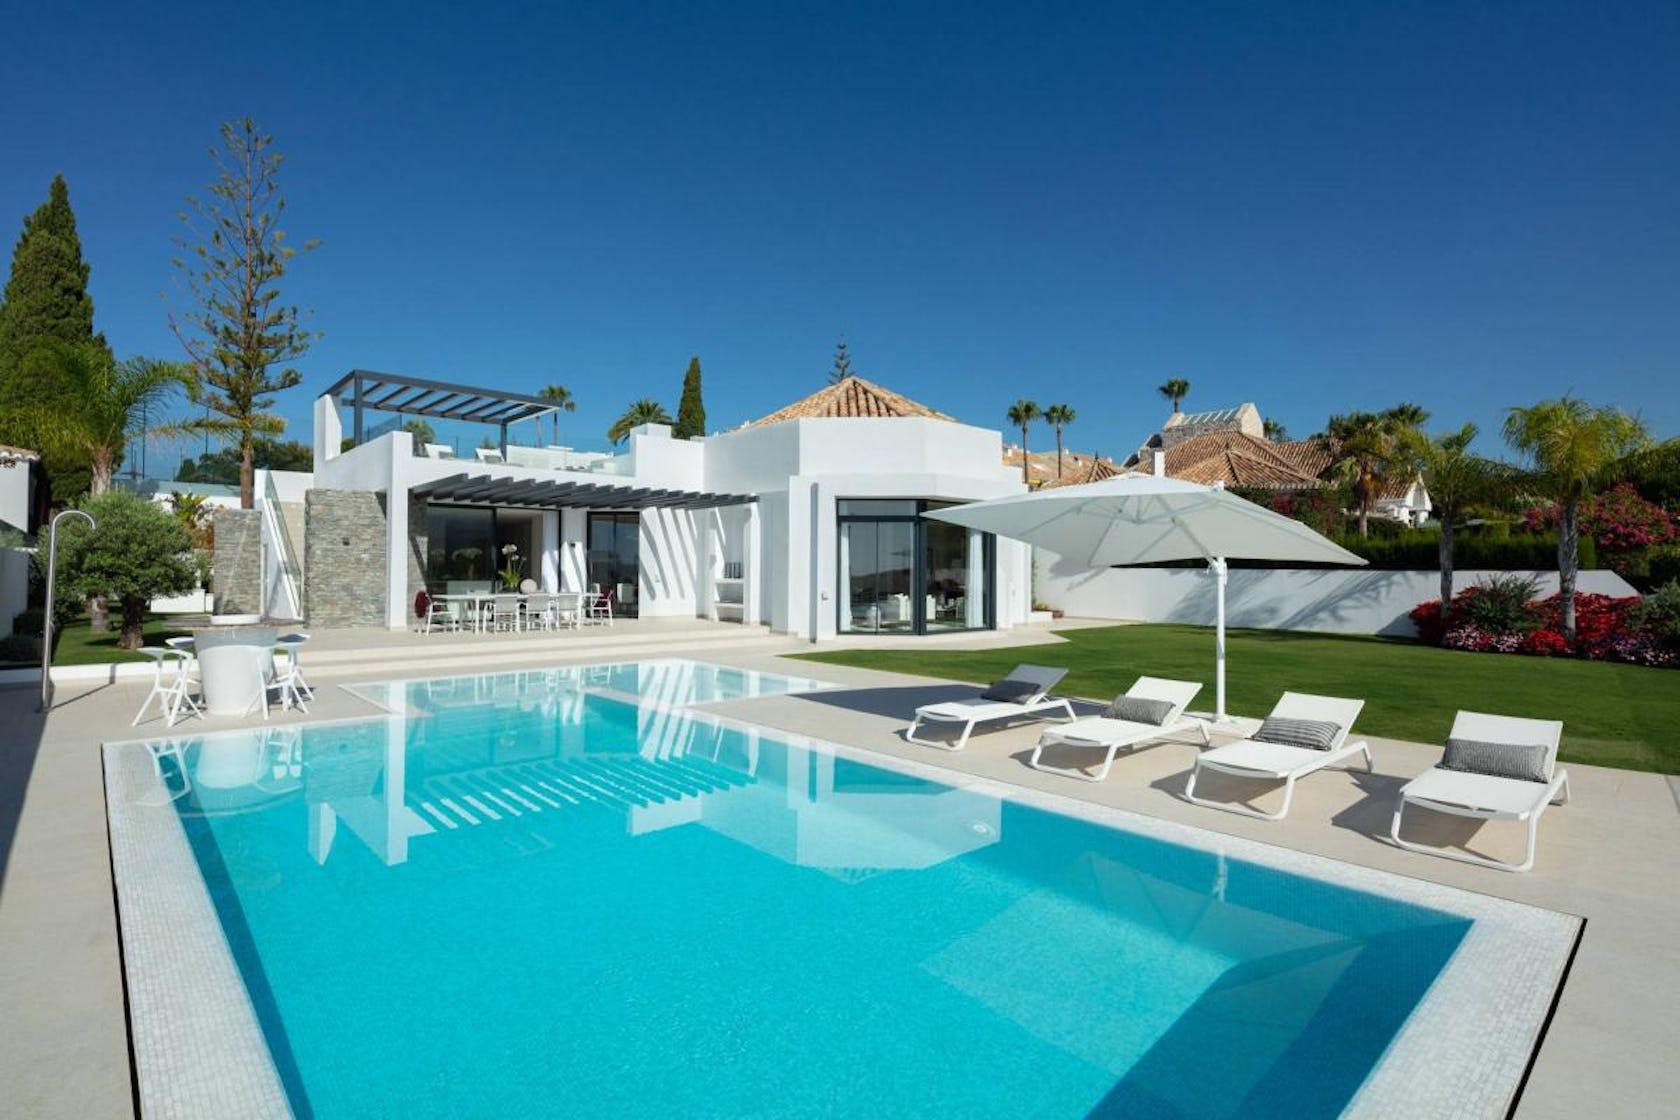 pool water villa housing house building swimming pool